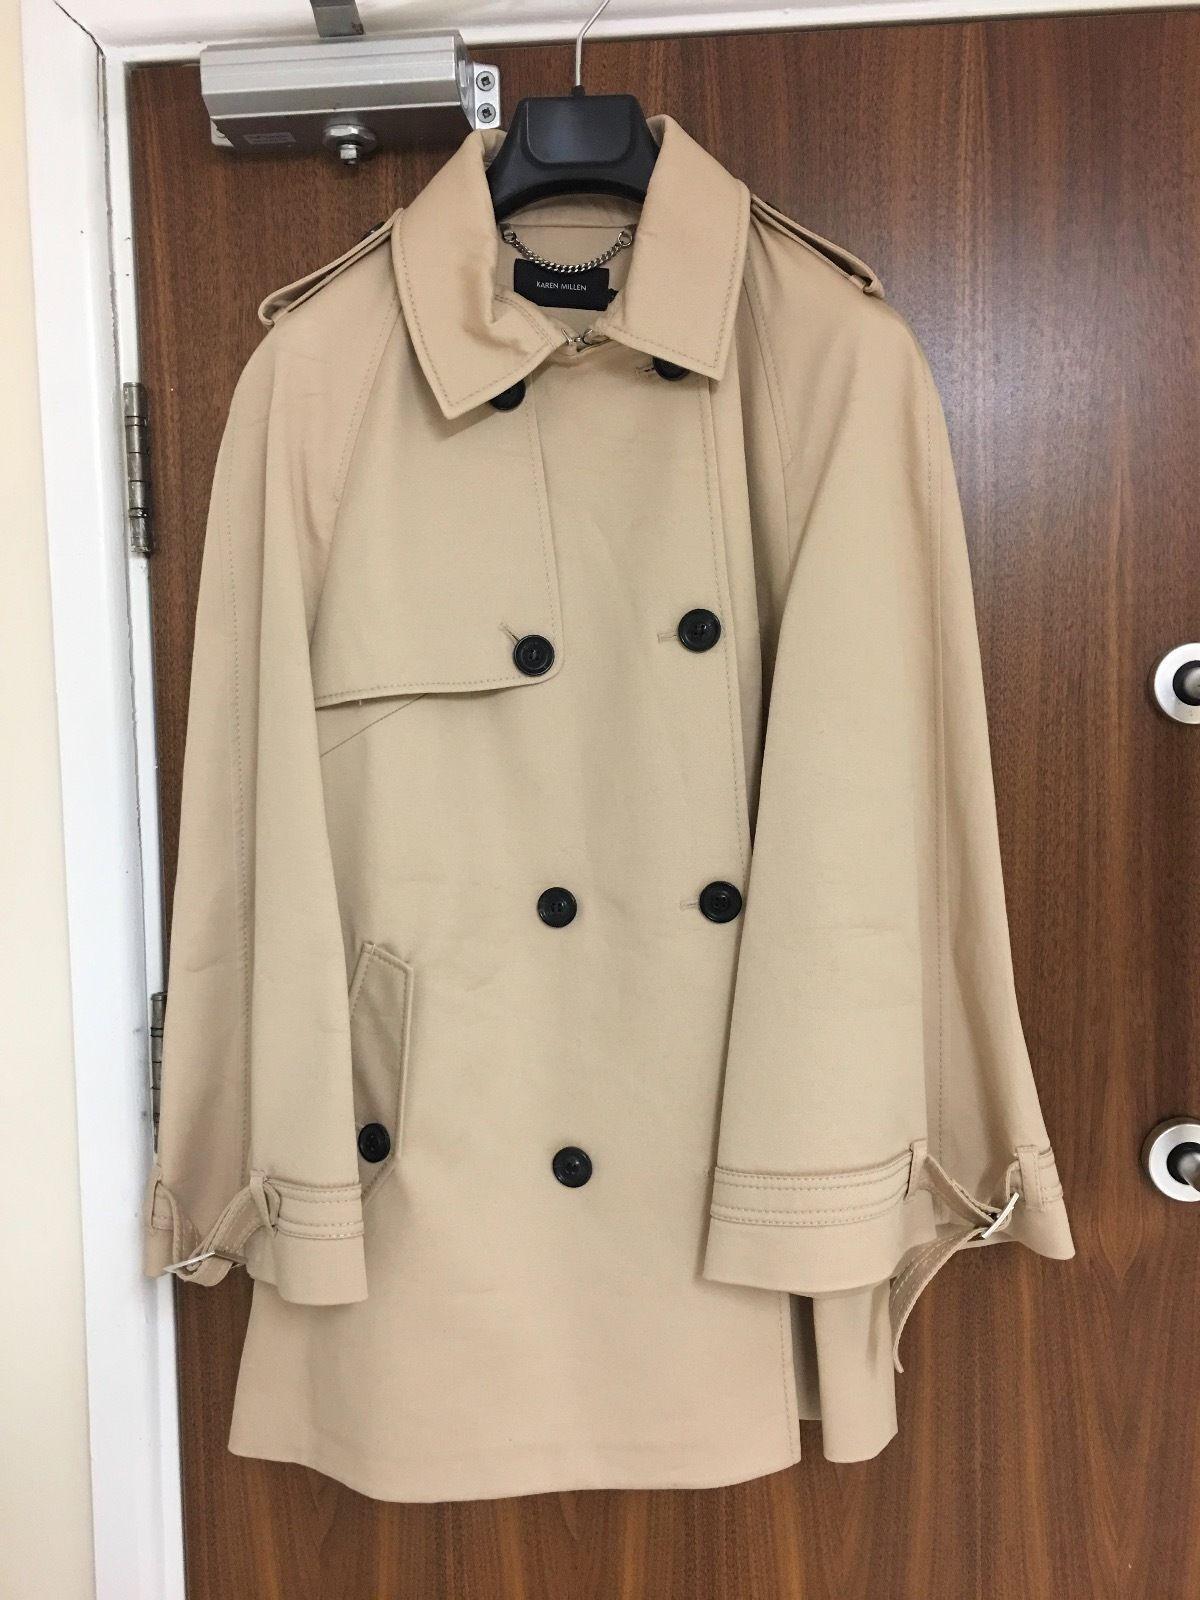 Karen Millen Modern Cotton Trench Coat Size    Sold Out    86b747